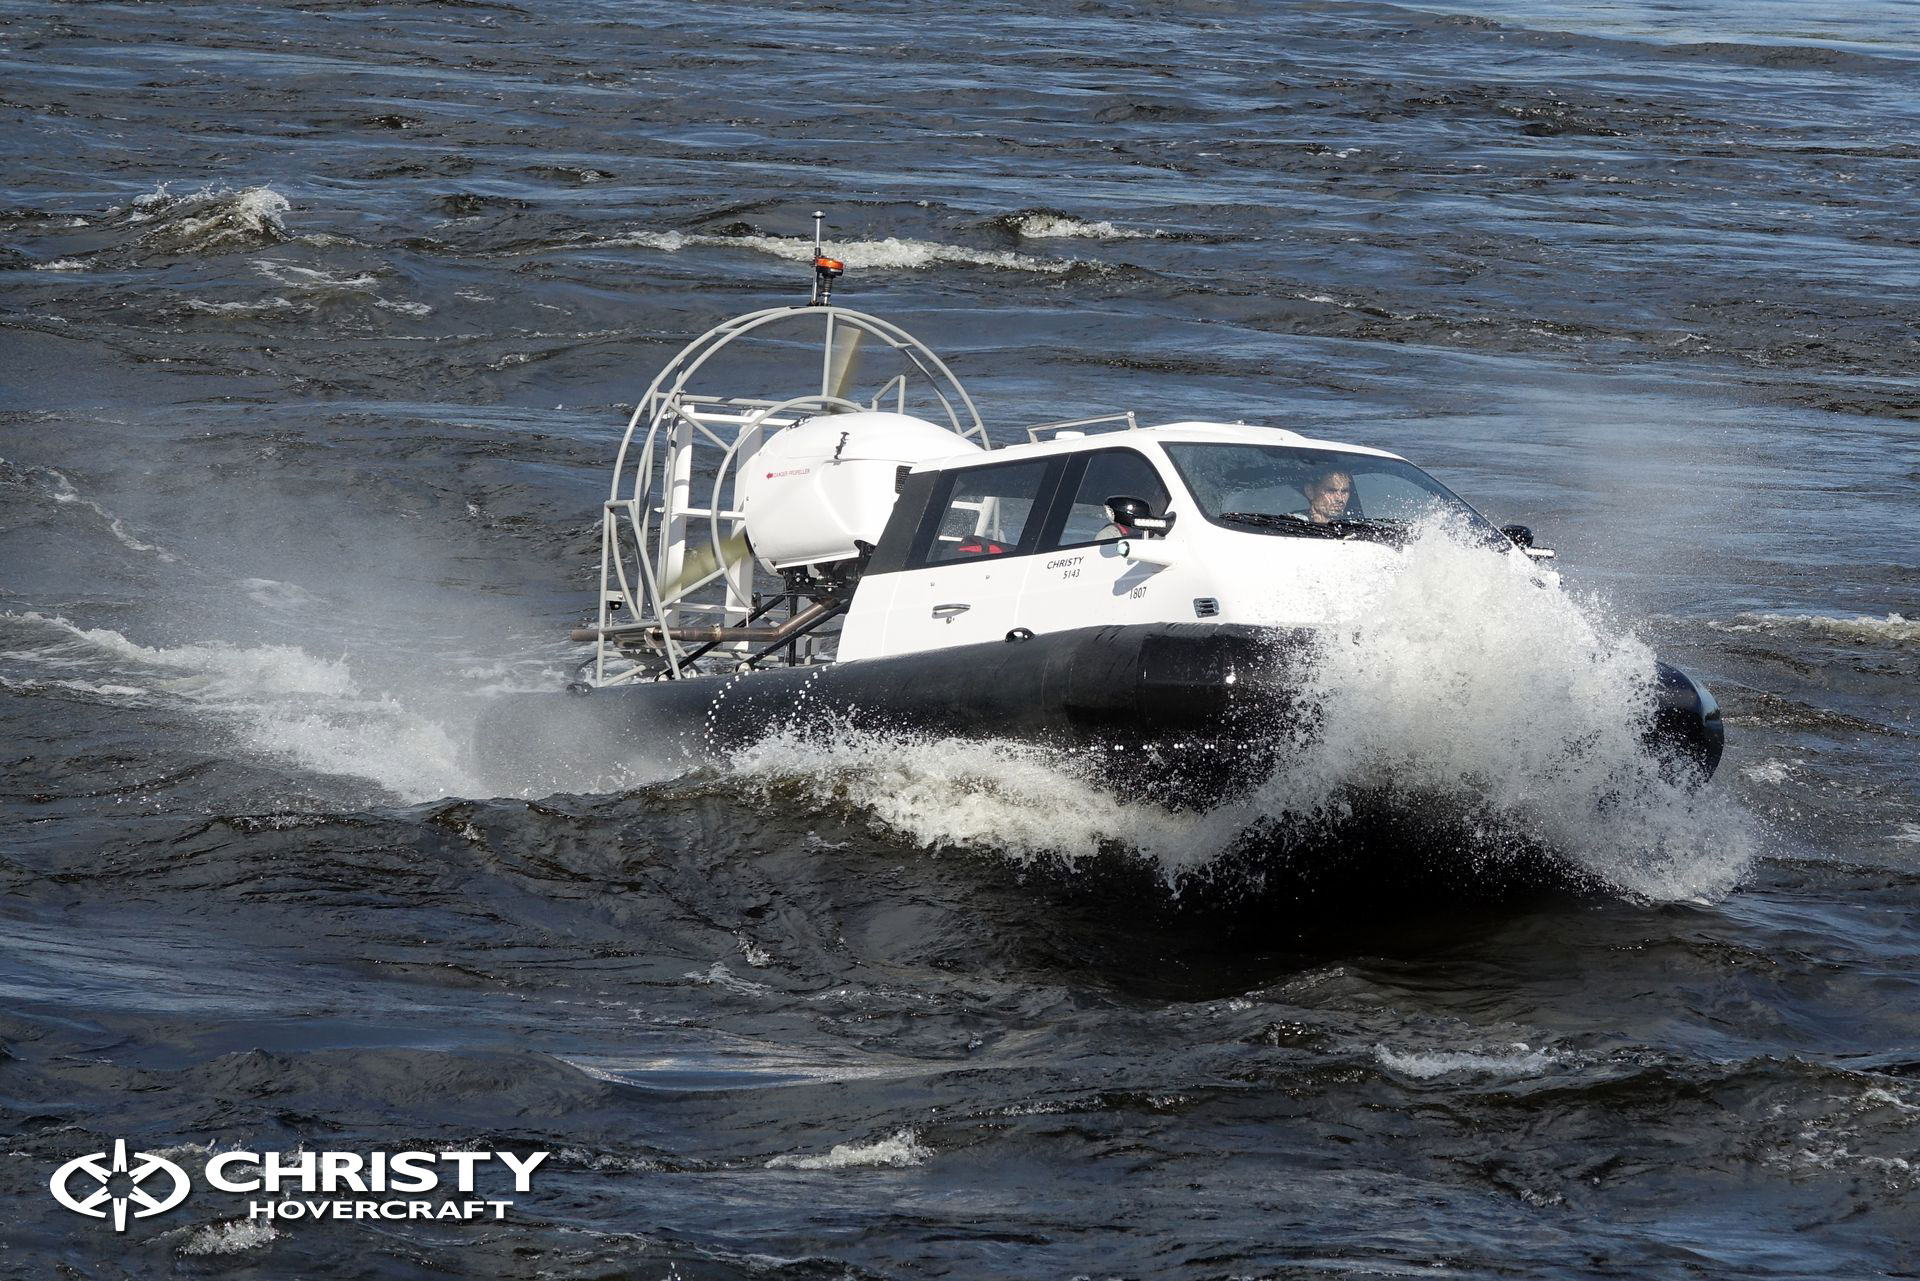 Hovercraft-Christy-5146-FC-13.jpg | фото №15